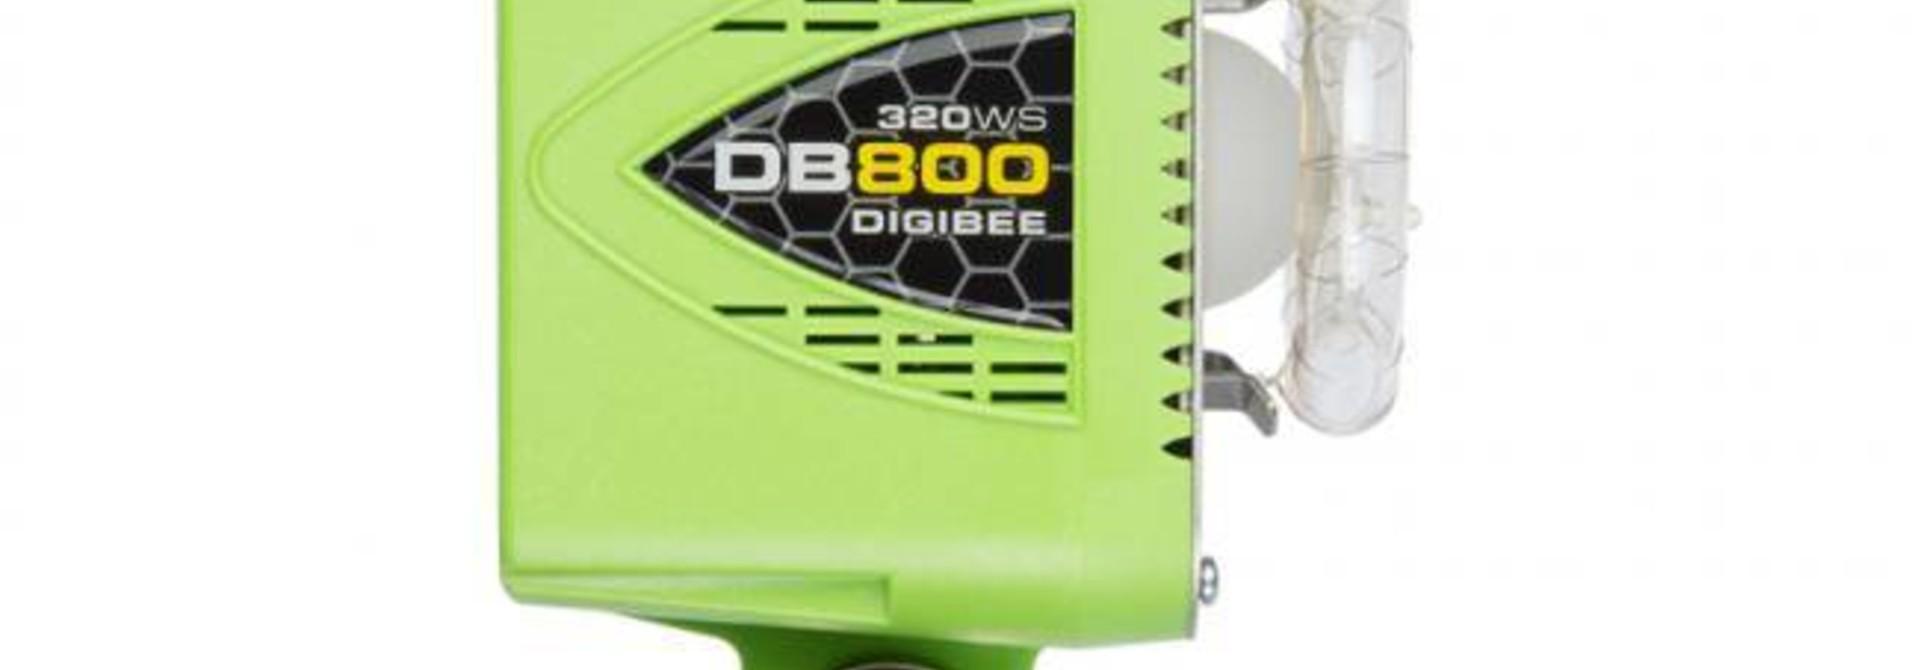 DigiBee Studioflitser- DB800